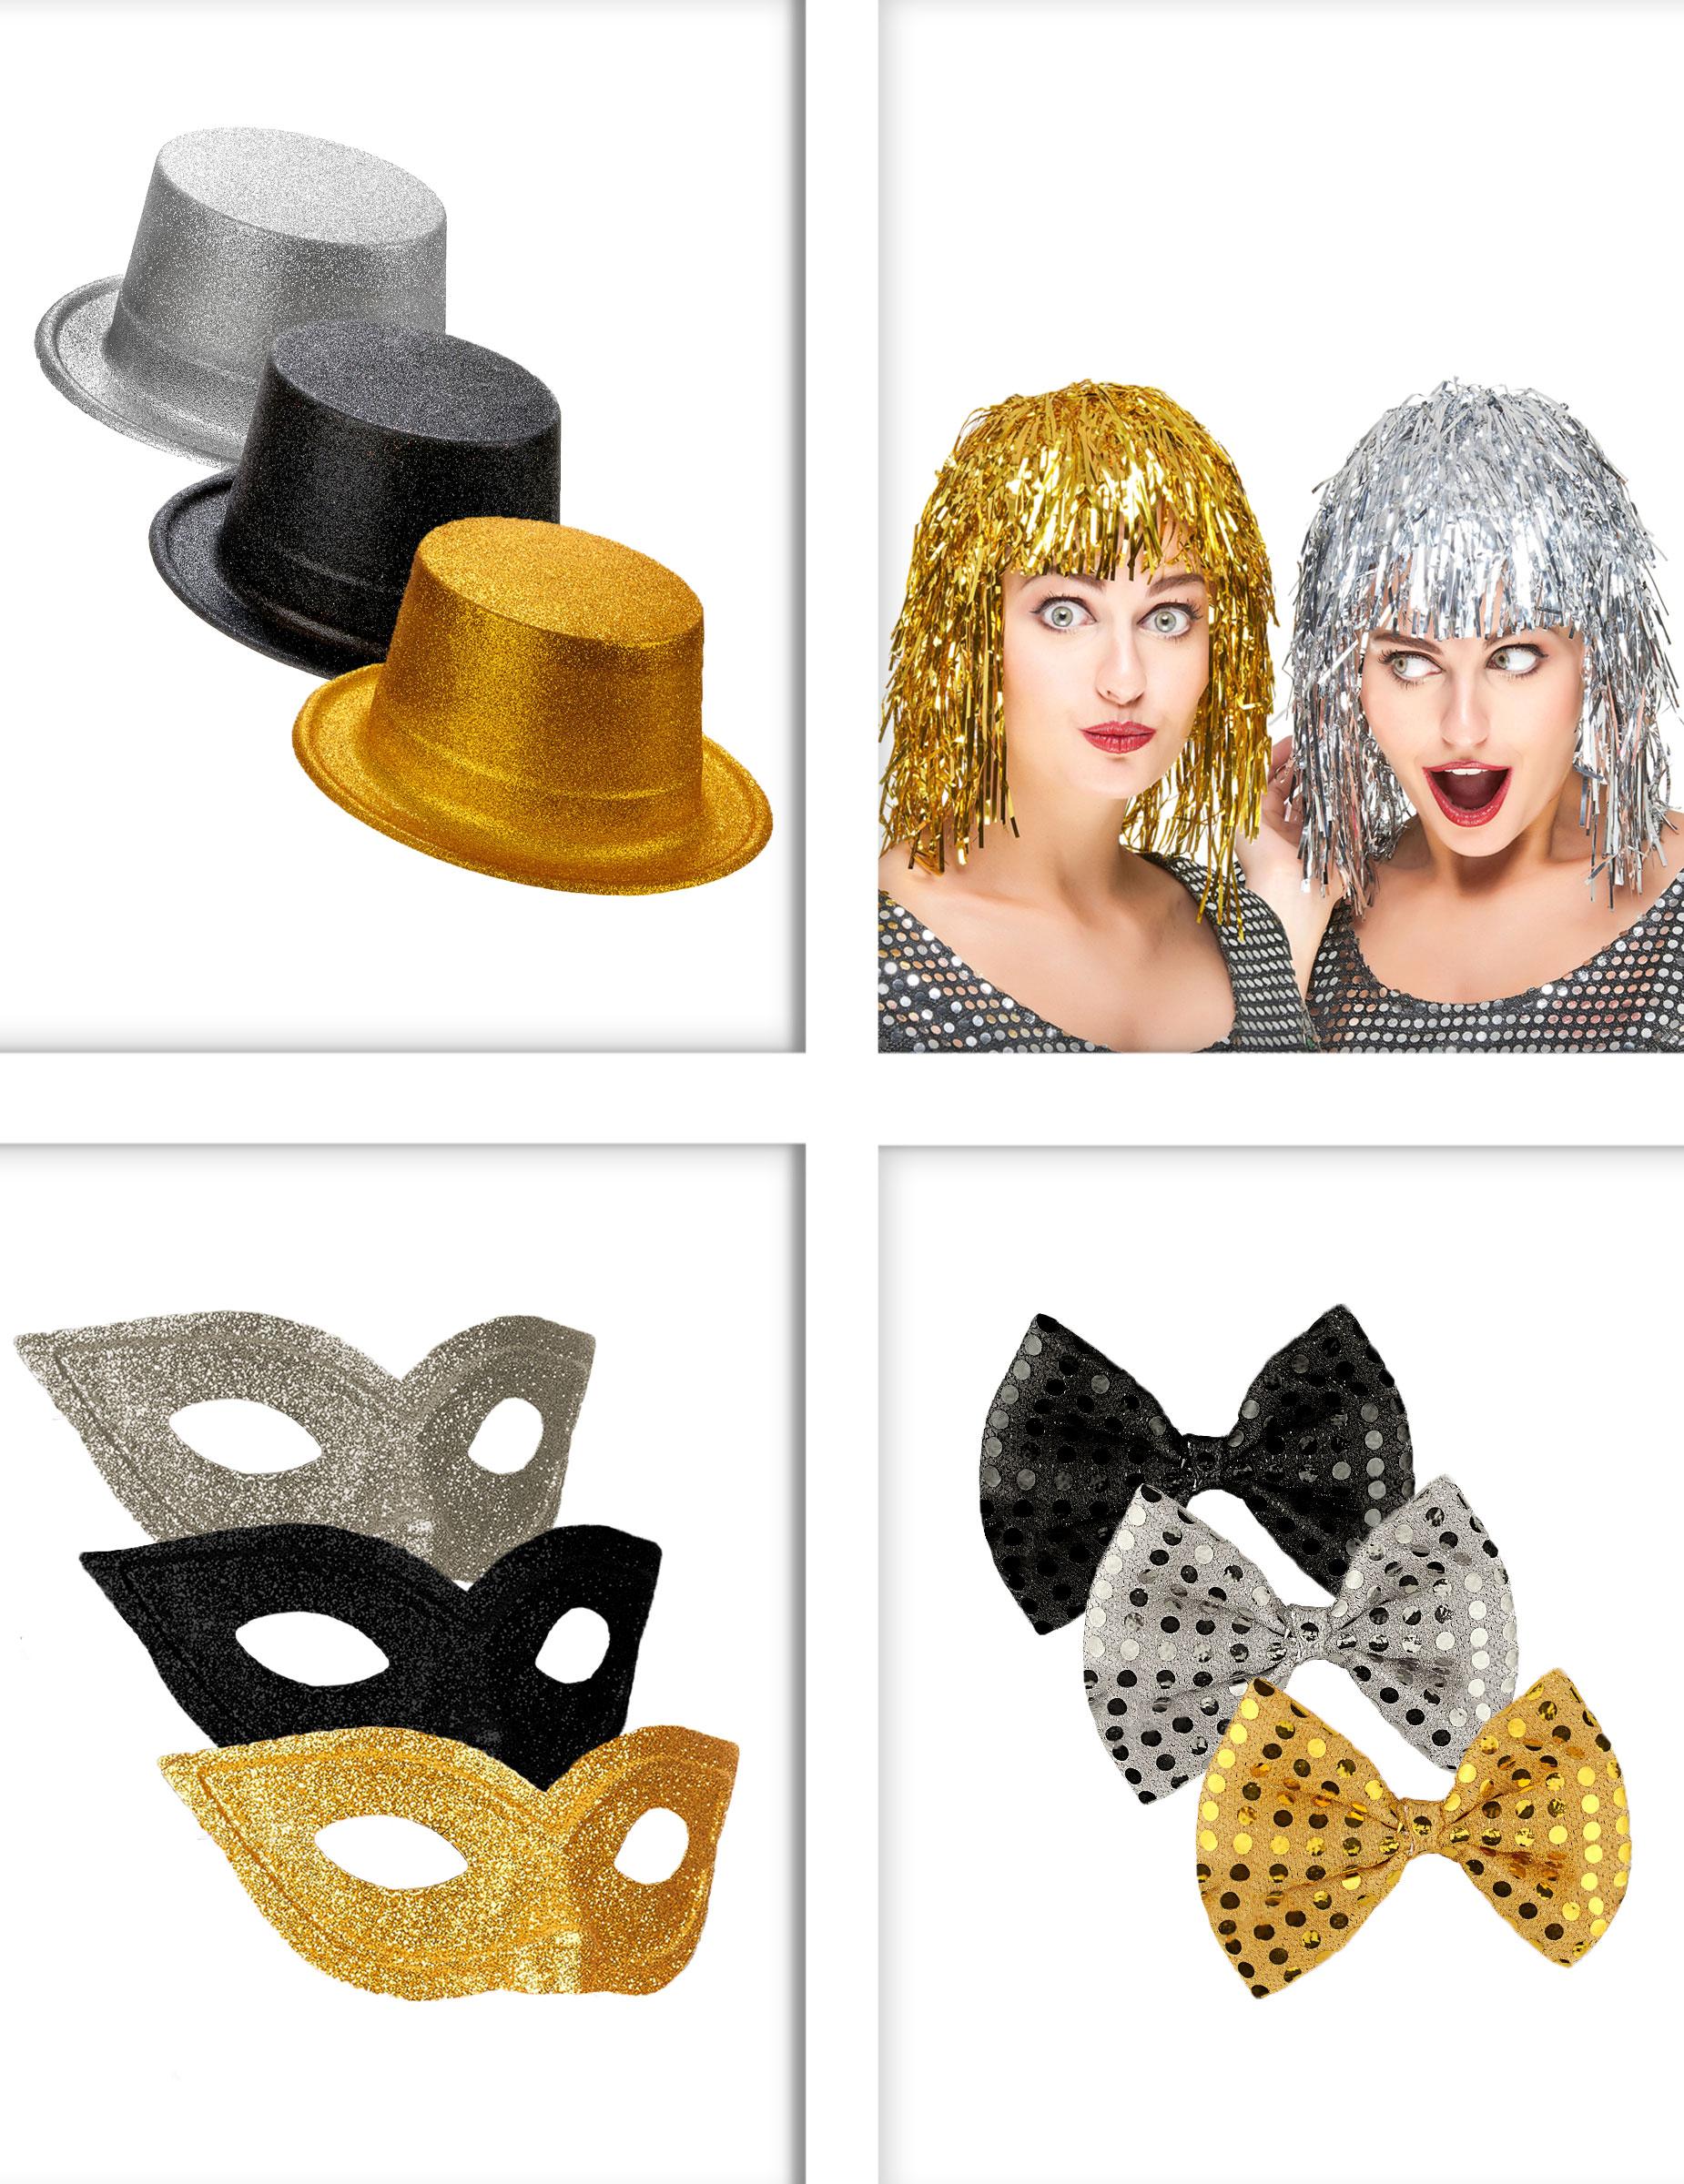 c2a5839cdb1b Kit accesorios de fiesta negro